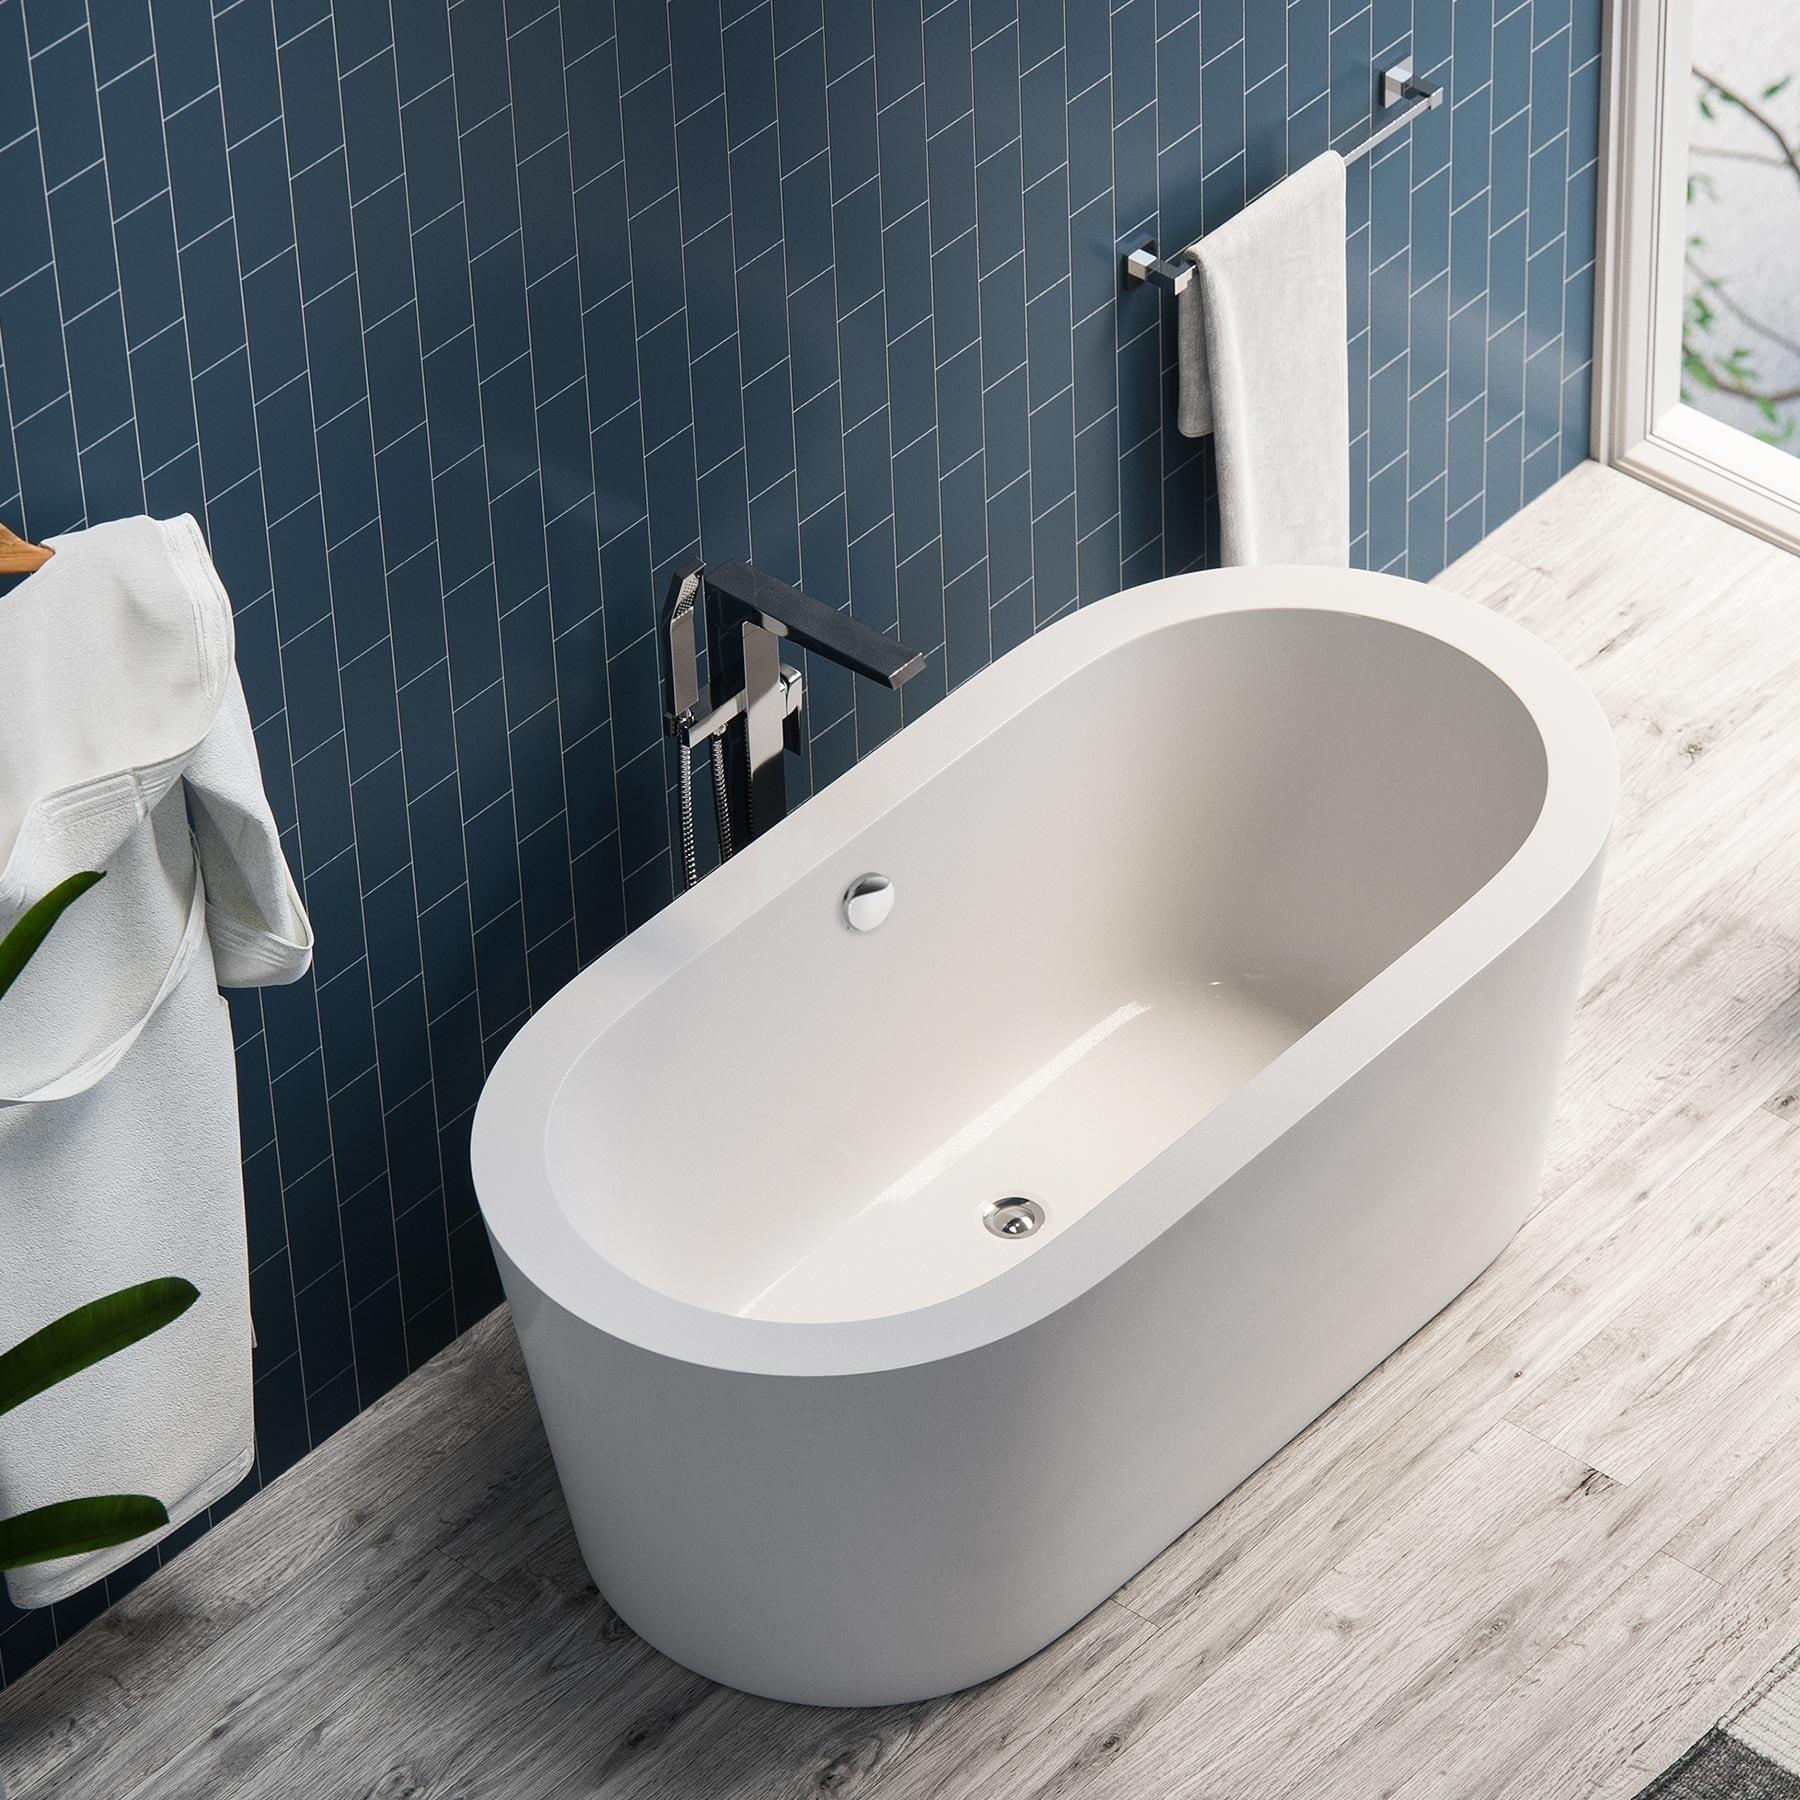 Maykke 59-inch Harrow Freestanding Bathtub (59 Inch Harro...